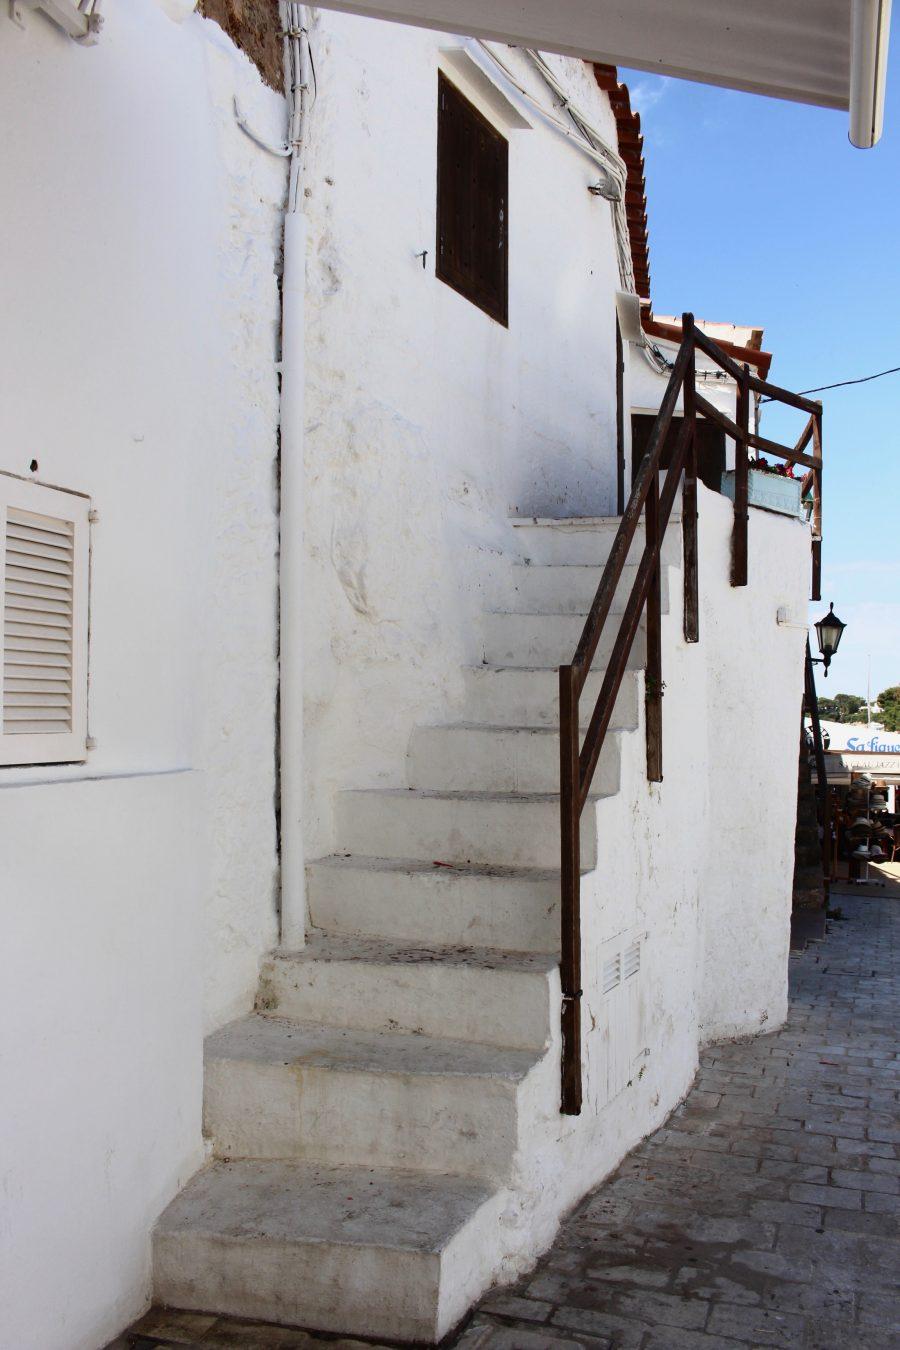 menorca 2018 travel spot spain